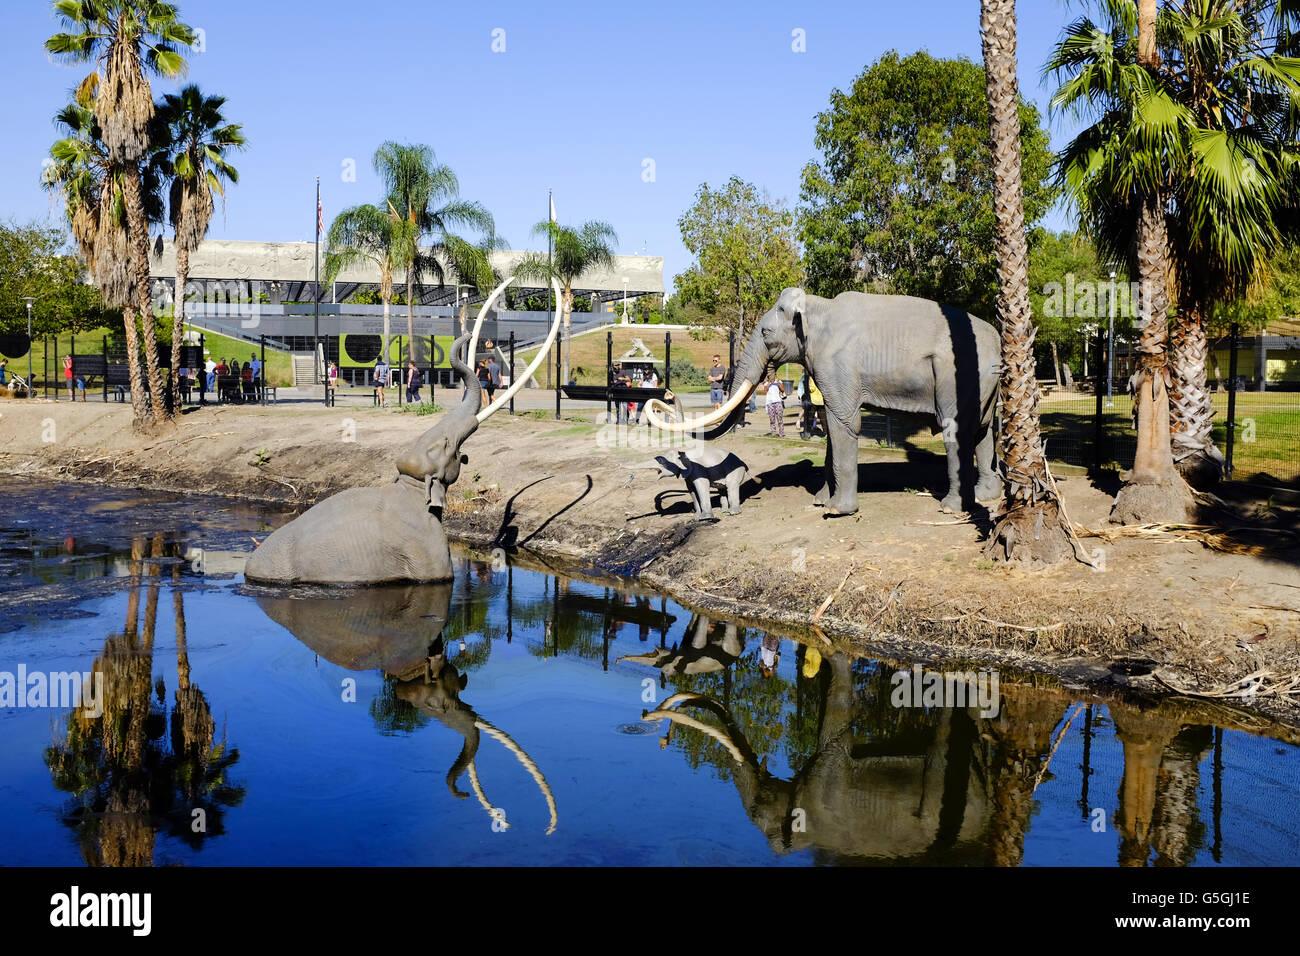 La Brea Tar Pit Los Angeles Mammoth ancient age history. - Stock Image